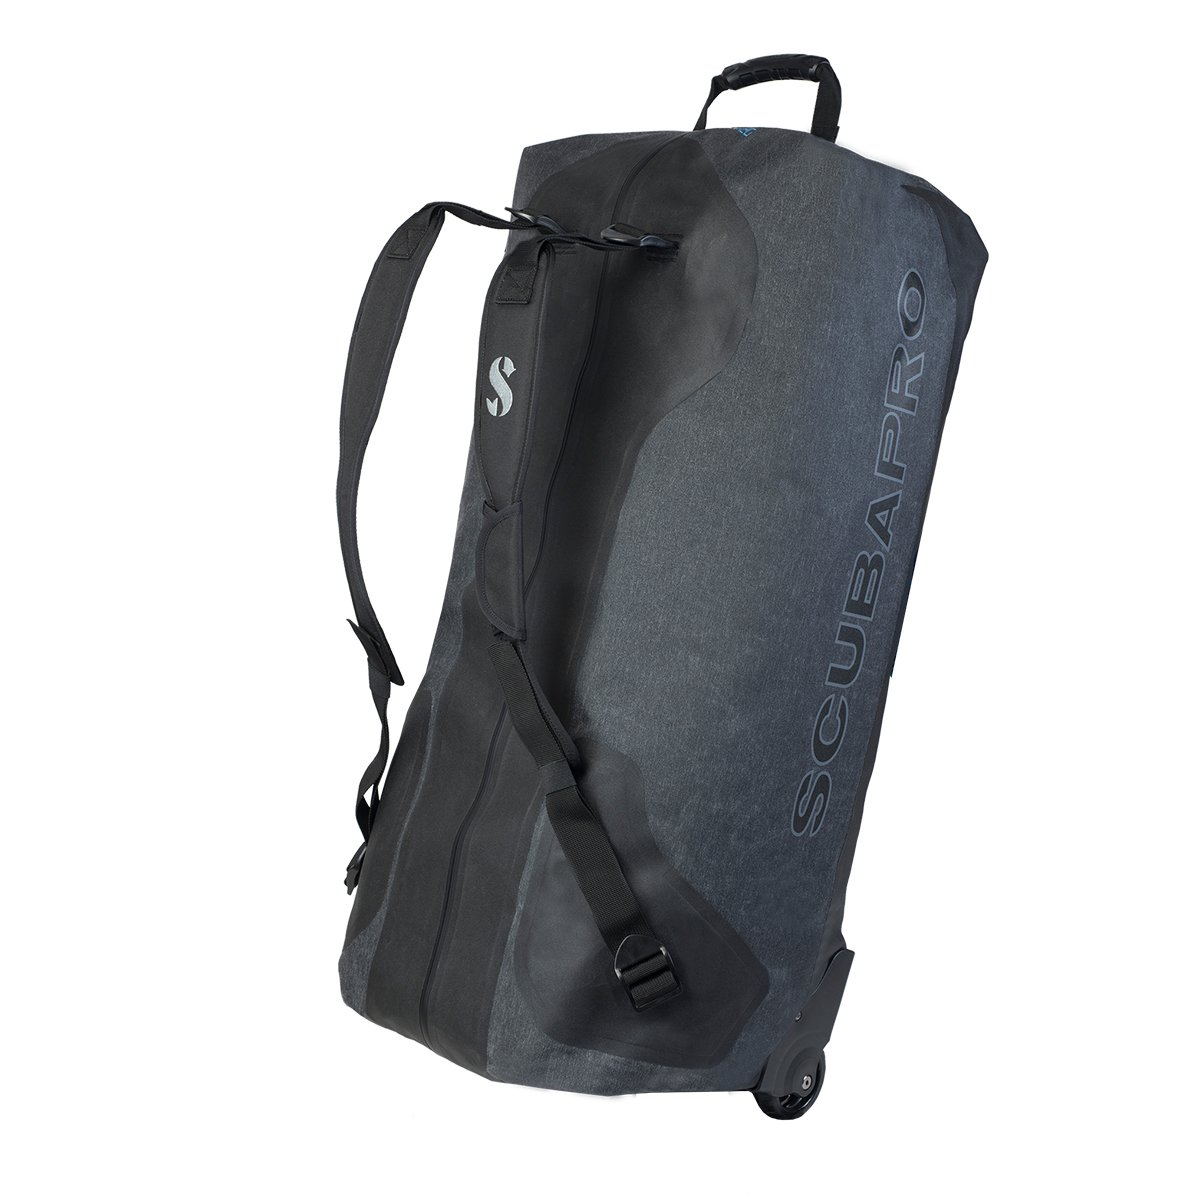 Dry Bag Backpack w/wheels, 120L